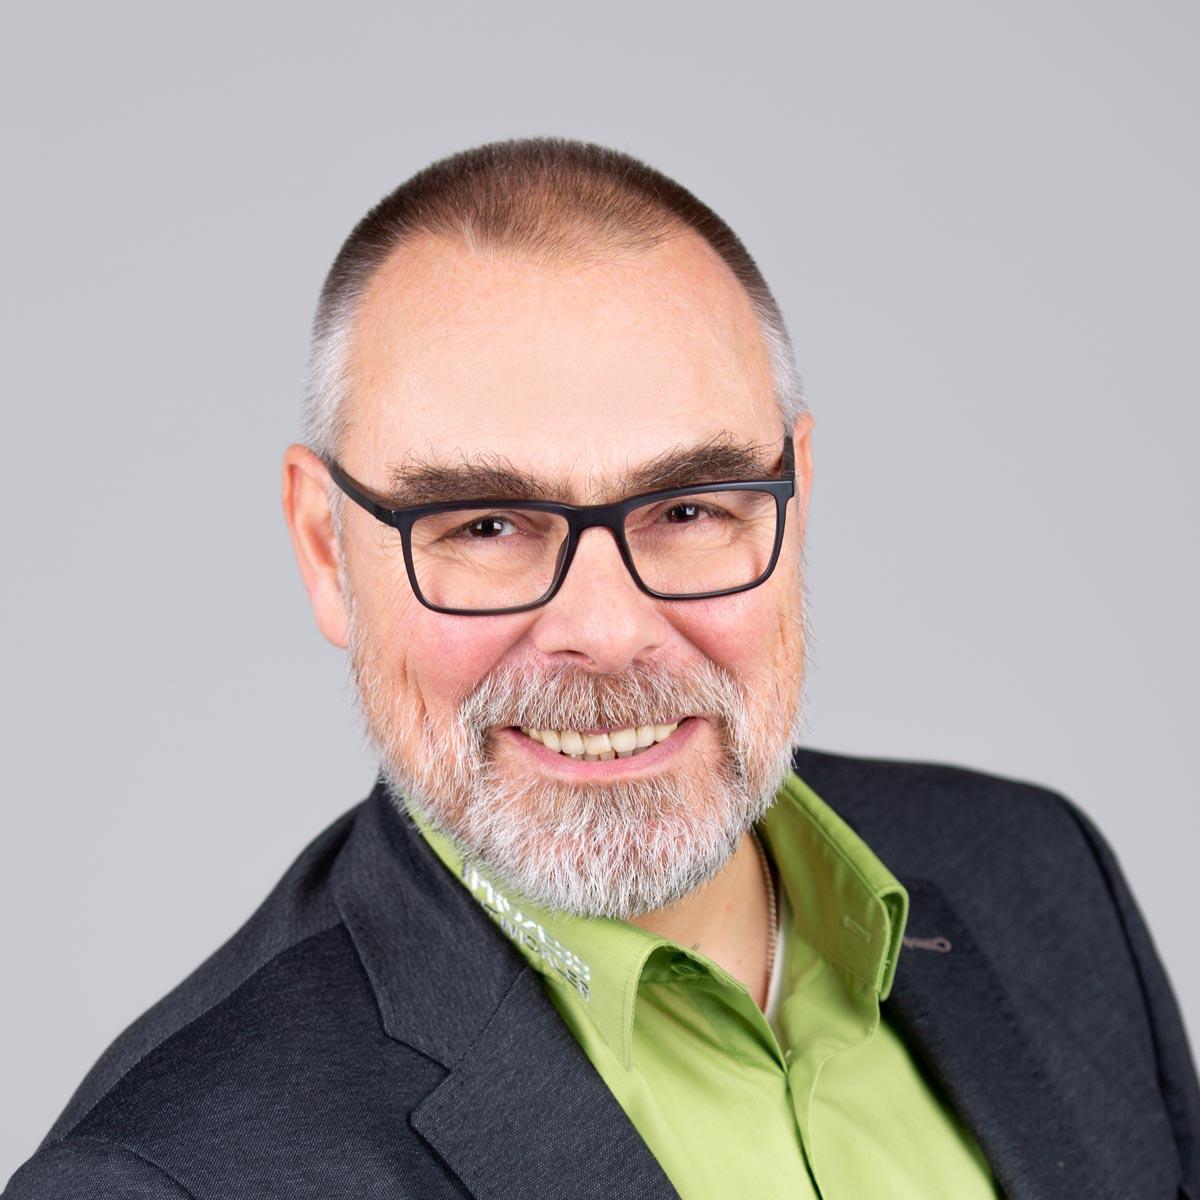 Christian Gerhards